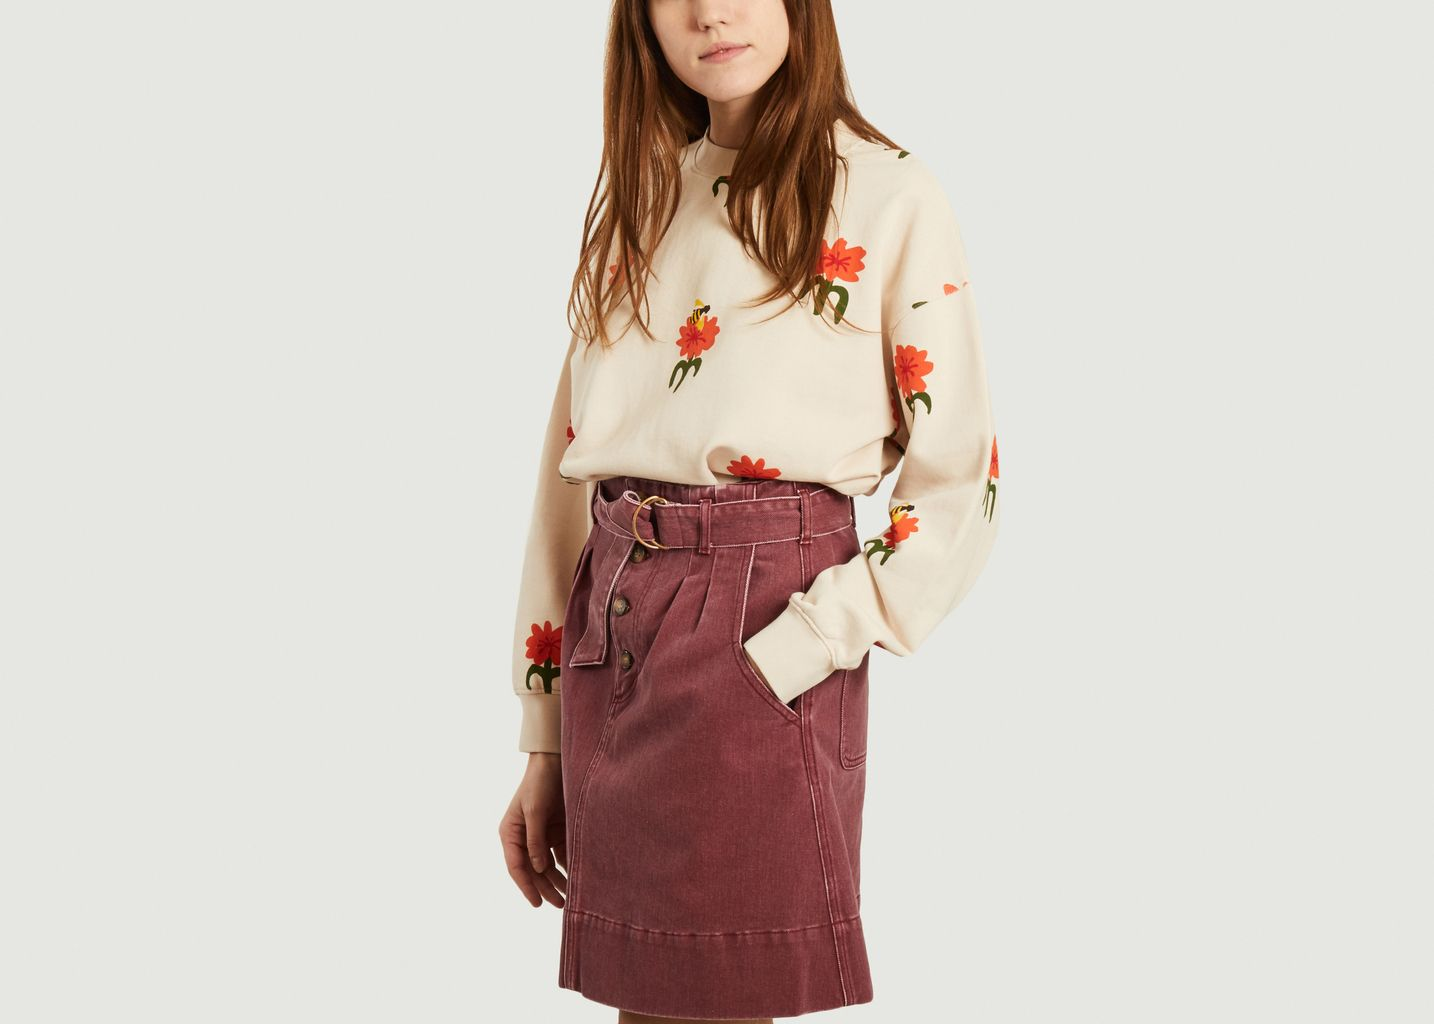 Sweatshirt Carnations - Thinking Mu